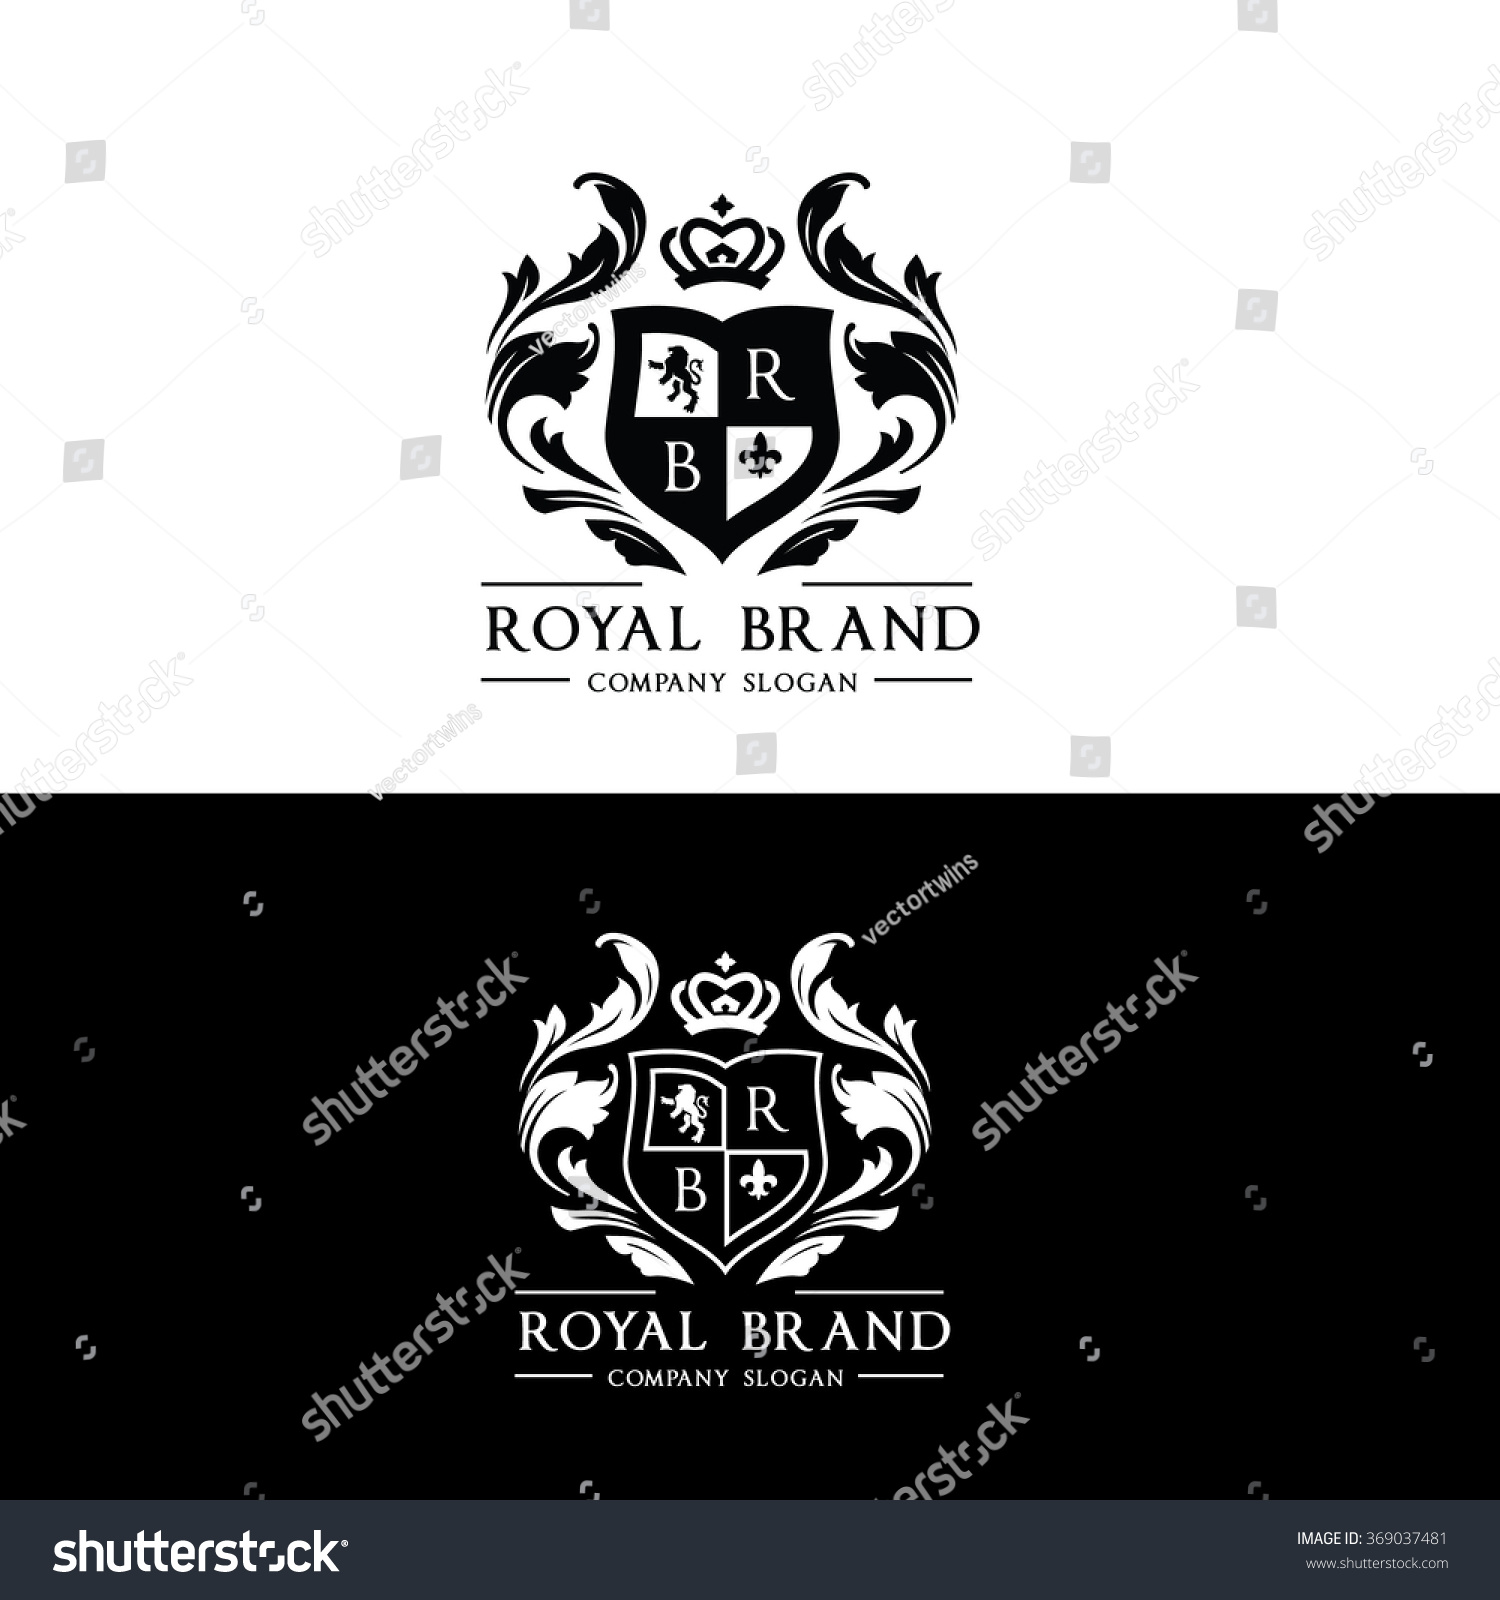 royal brand logocrown logolion logocrest logovector